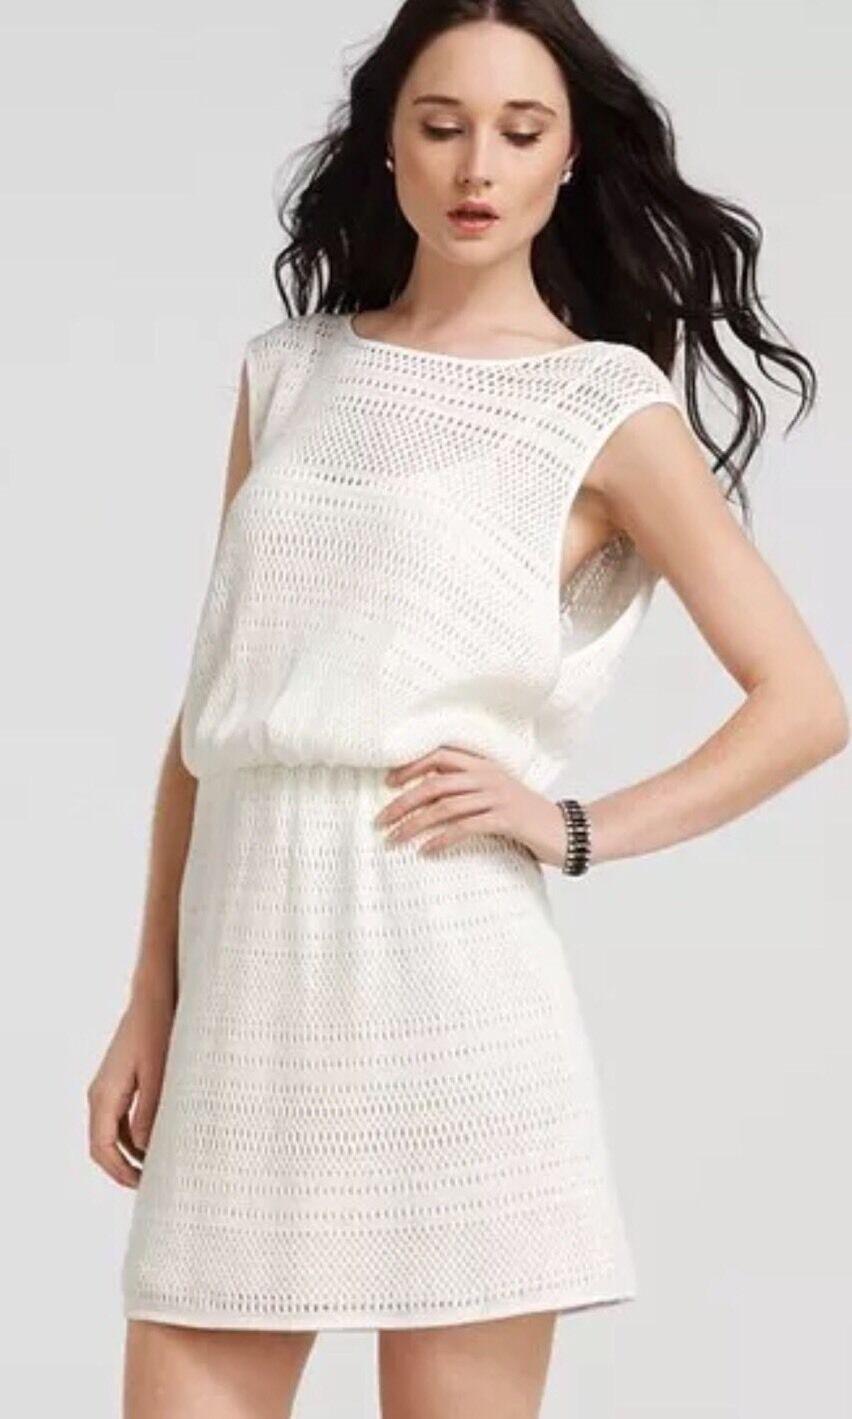 338 Para Mujer Crochet Marfil Vestido de punto abierto TIBI Cazadora gota de cintura Mod Crema Talla L  bienvenido a orden